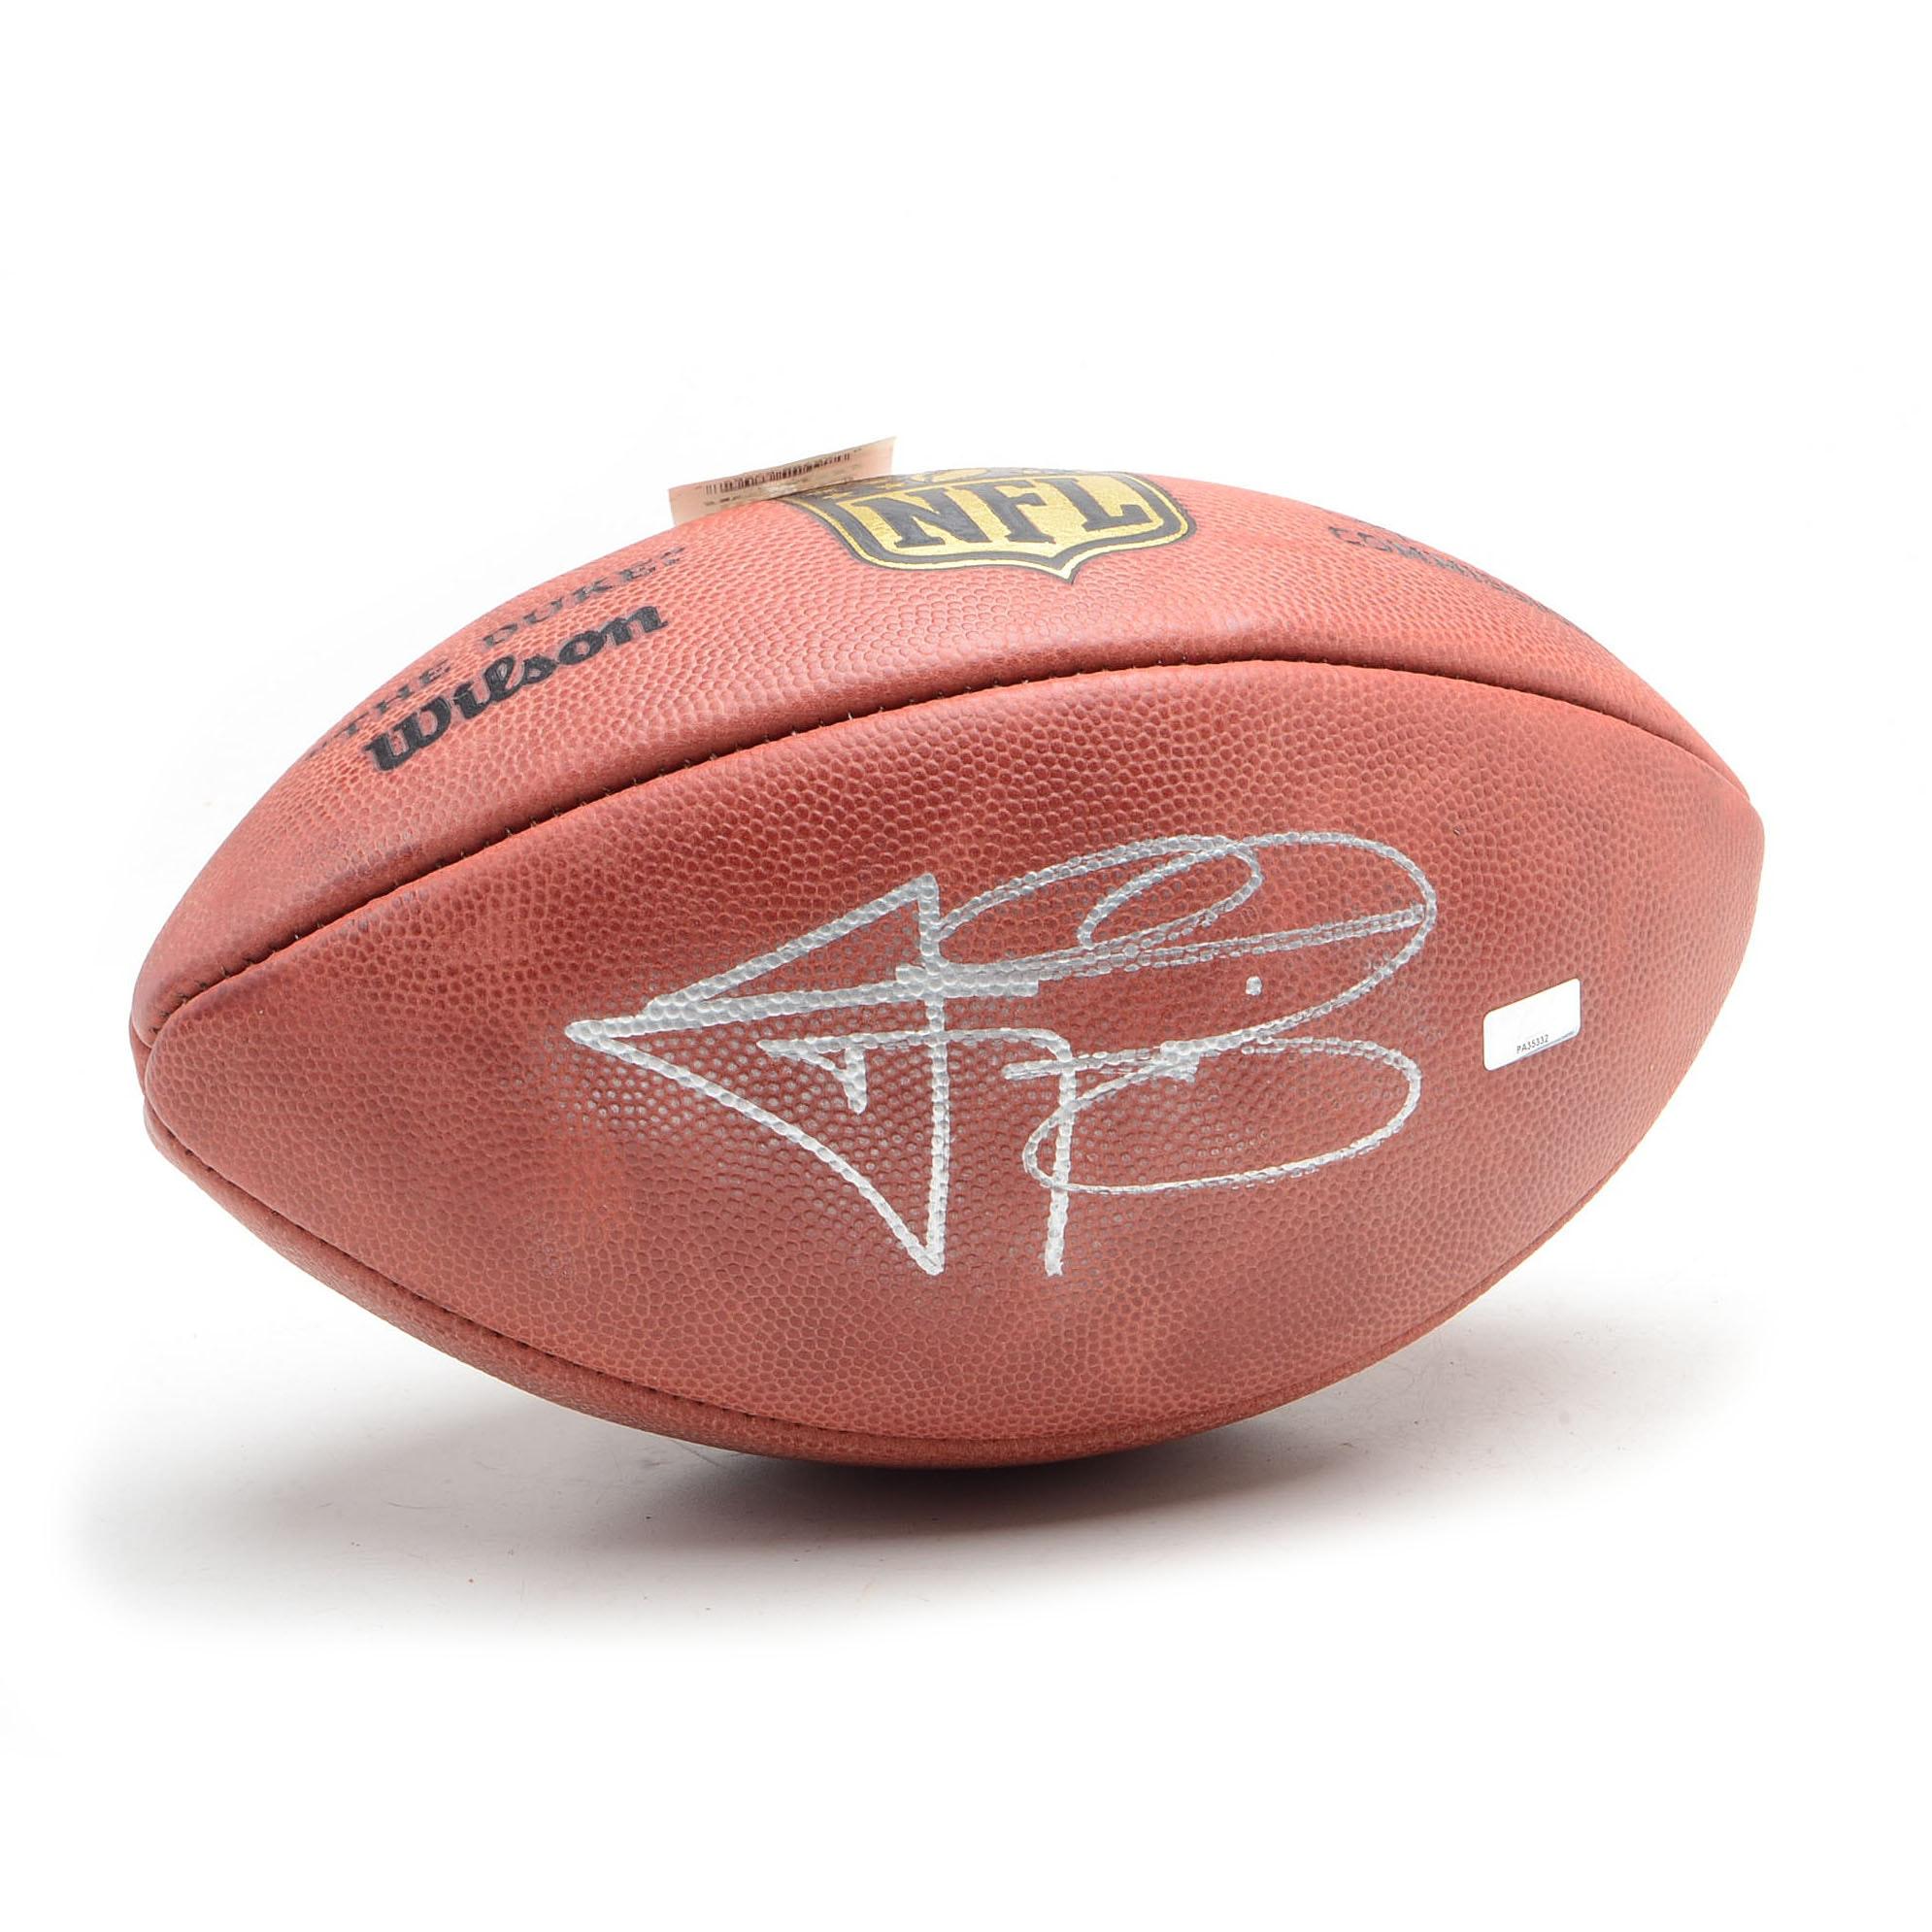 Johnny Manziel Autographed NFL Football  COA